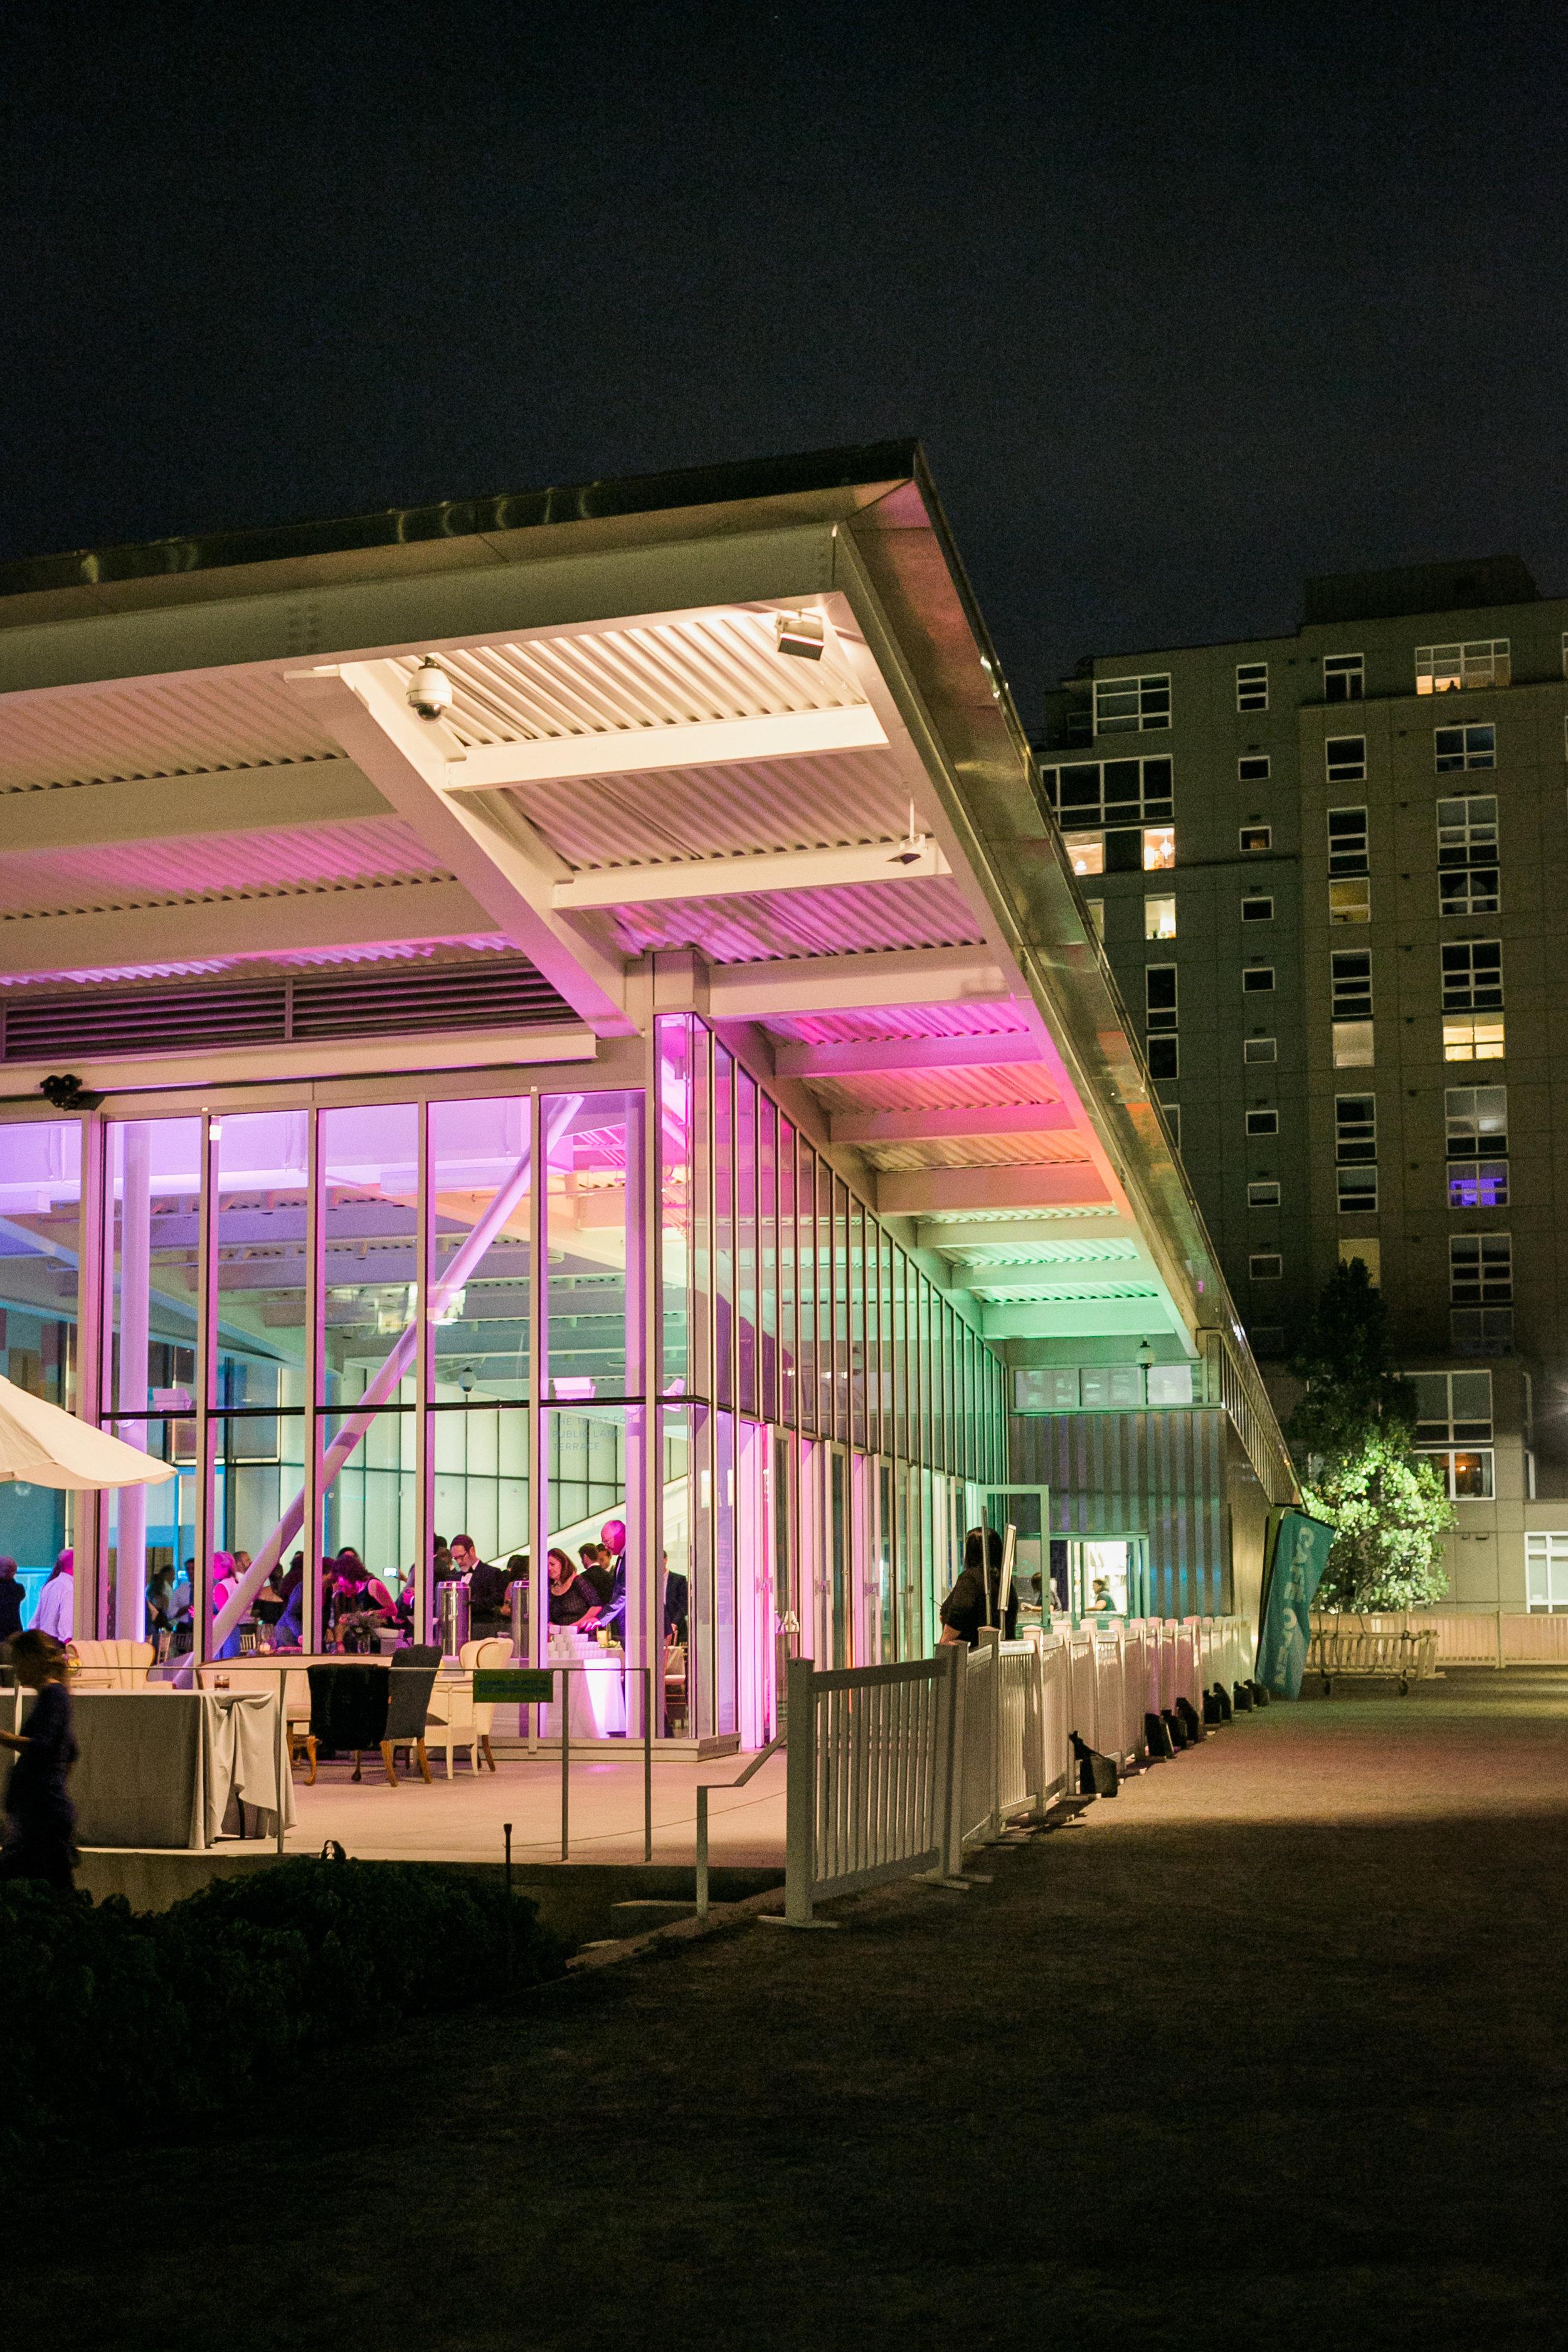 seattle-wedding-reception-olympic sculpture park-party-northwest-modern